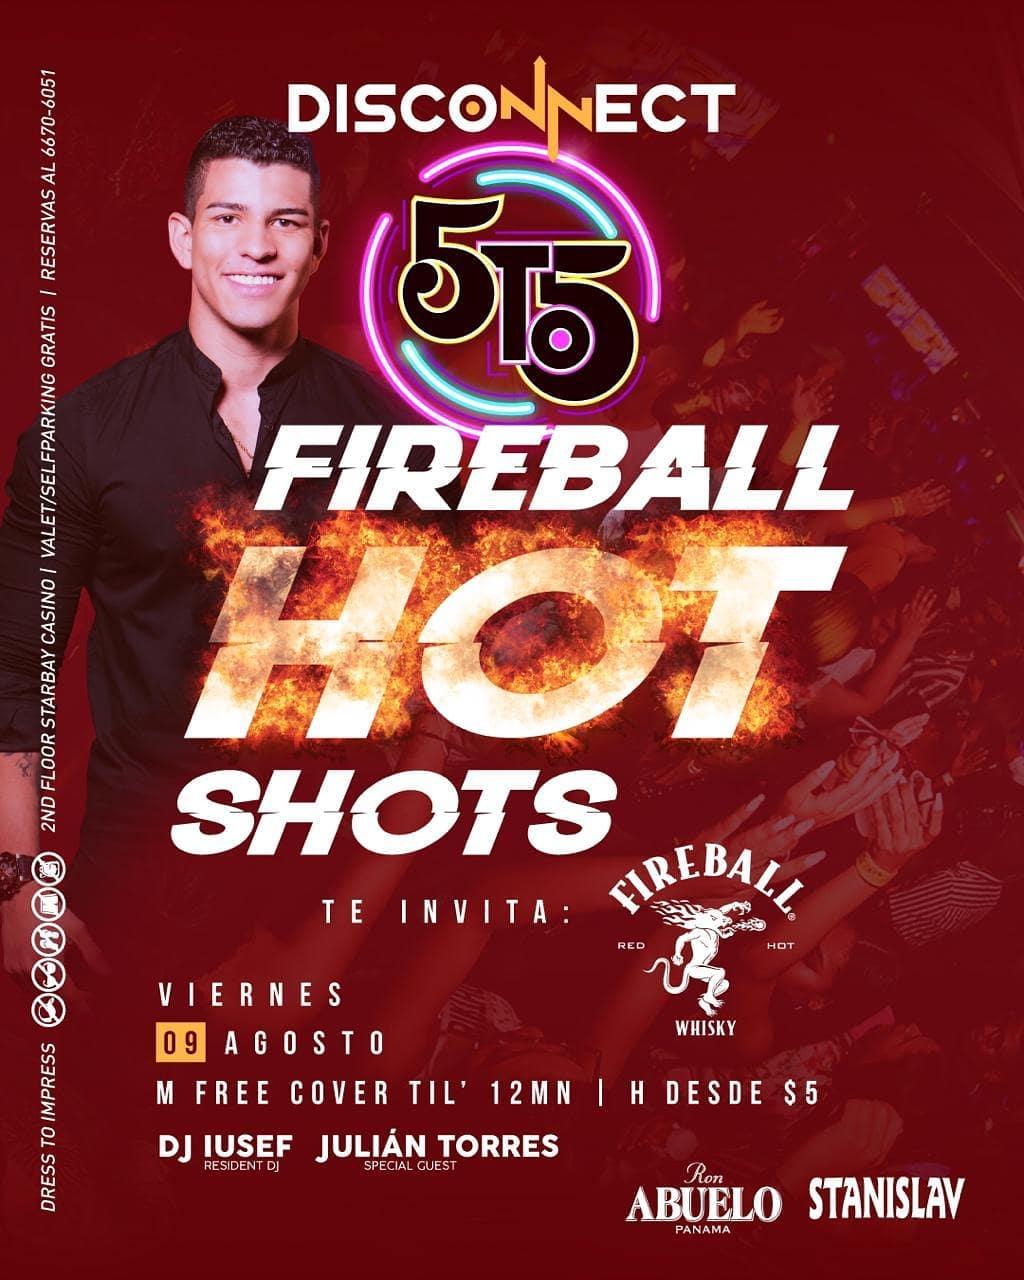 Photo of La disco 5to5 Panamá presenta este viernes 09 de agosto un show 'Fireball Hot Shots'